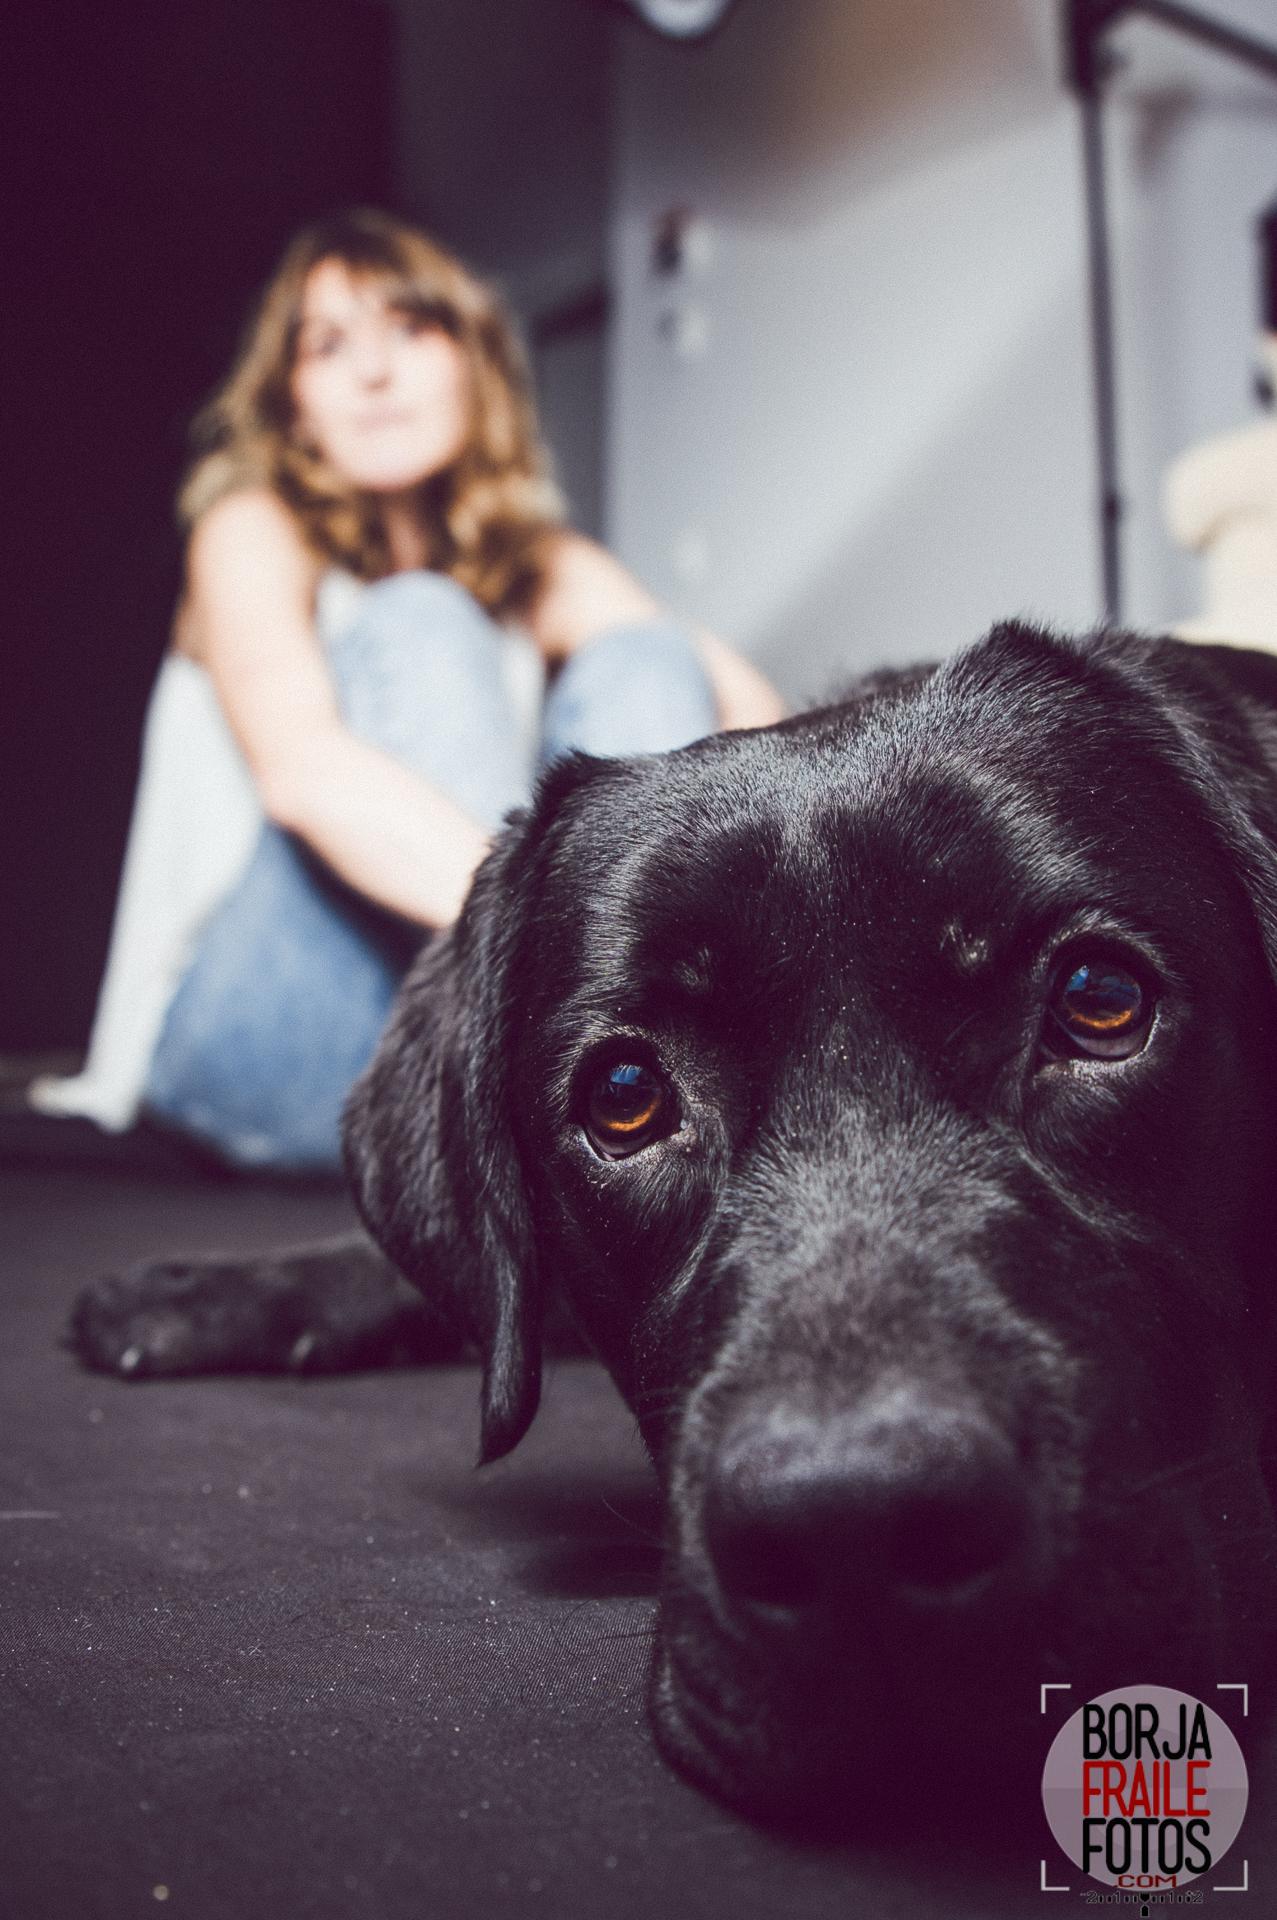 20210102panceta395 - Panceta, perra modelo... fotos de perros.